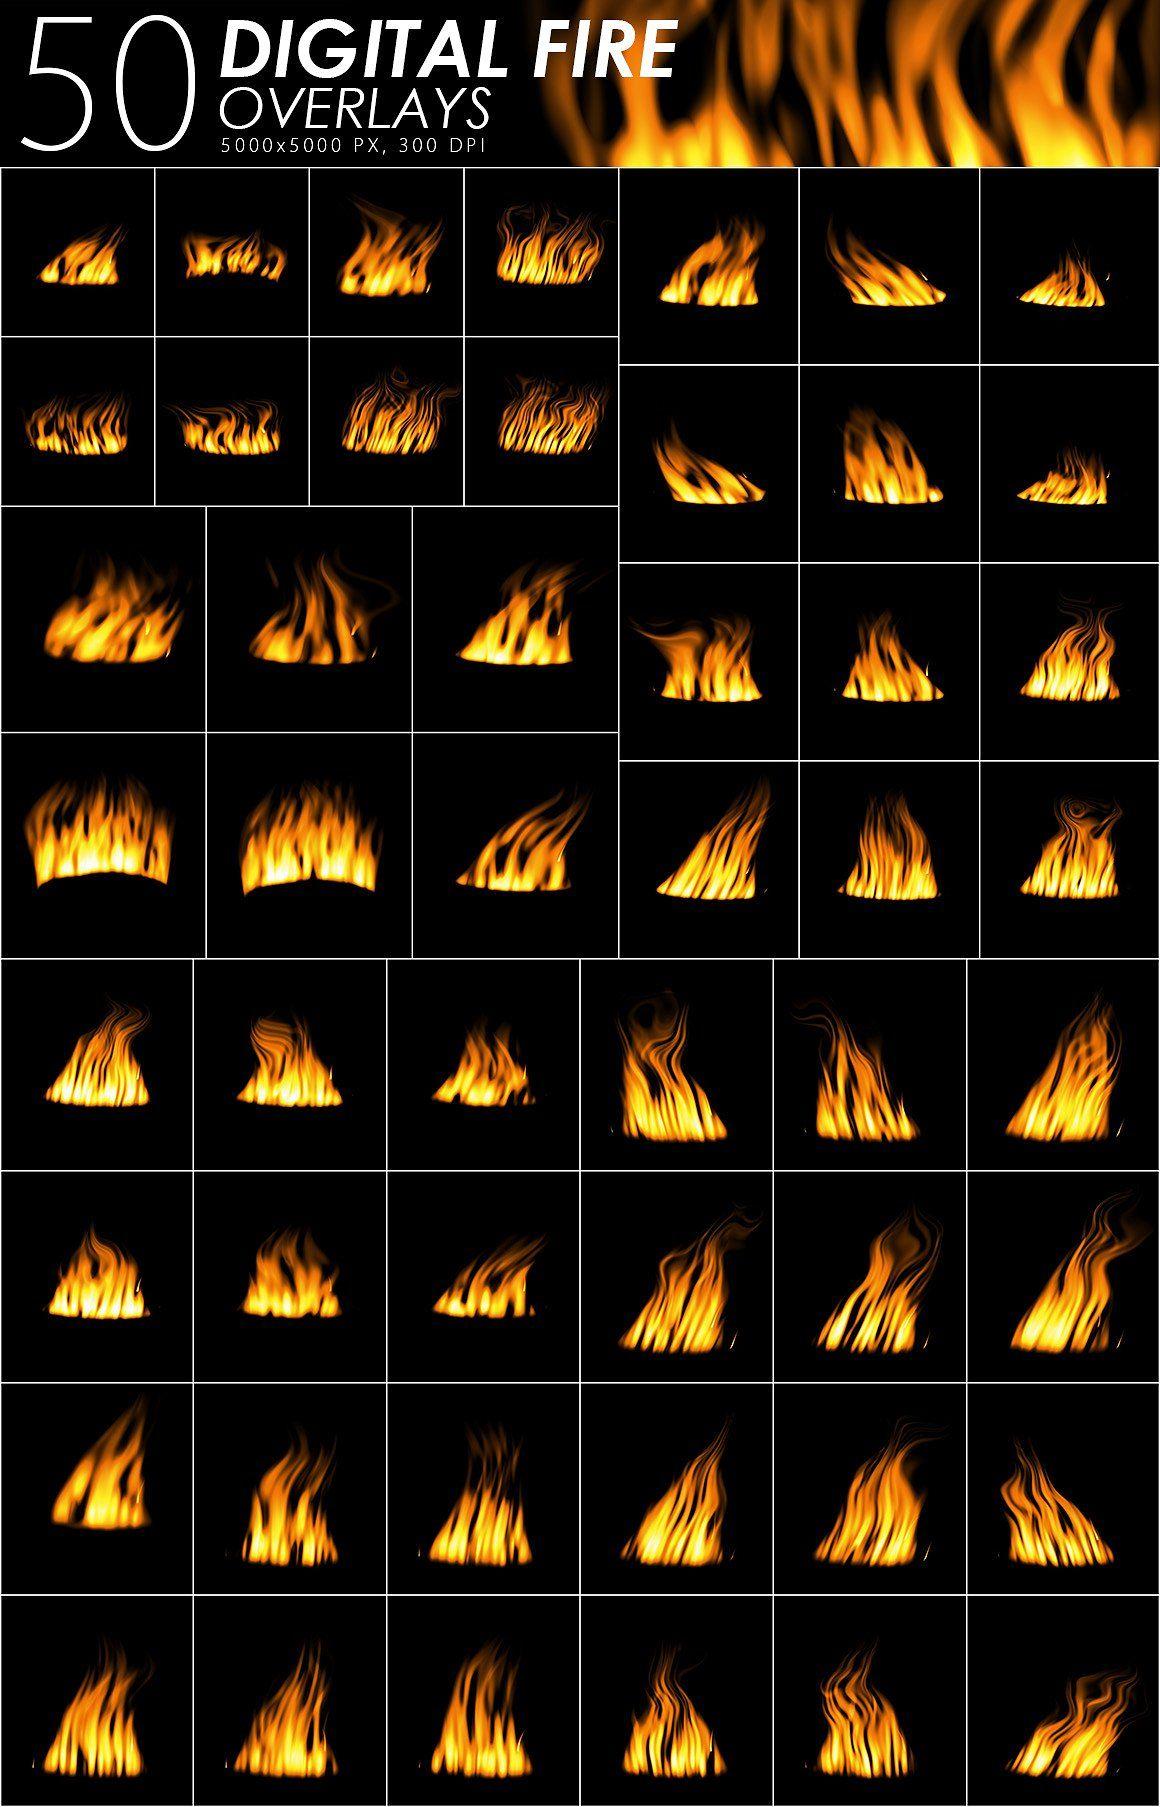 575 Fire, Smoke, Fog Overlays textures